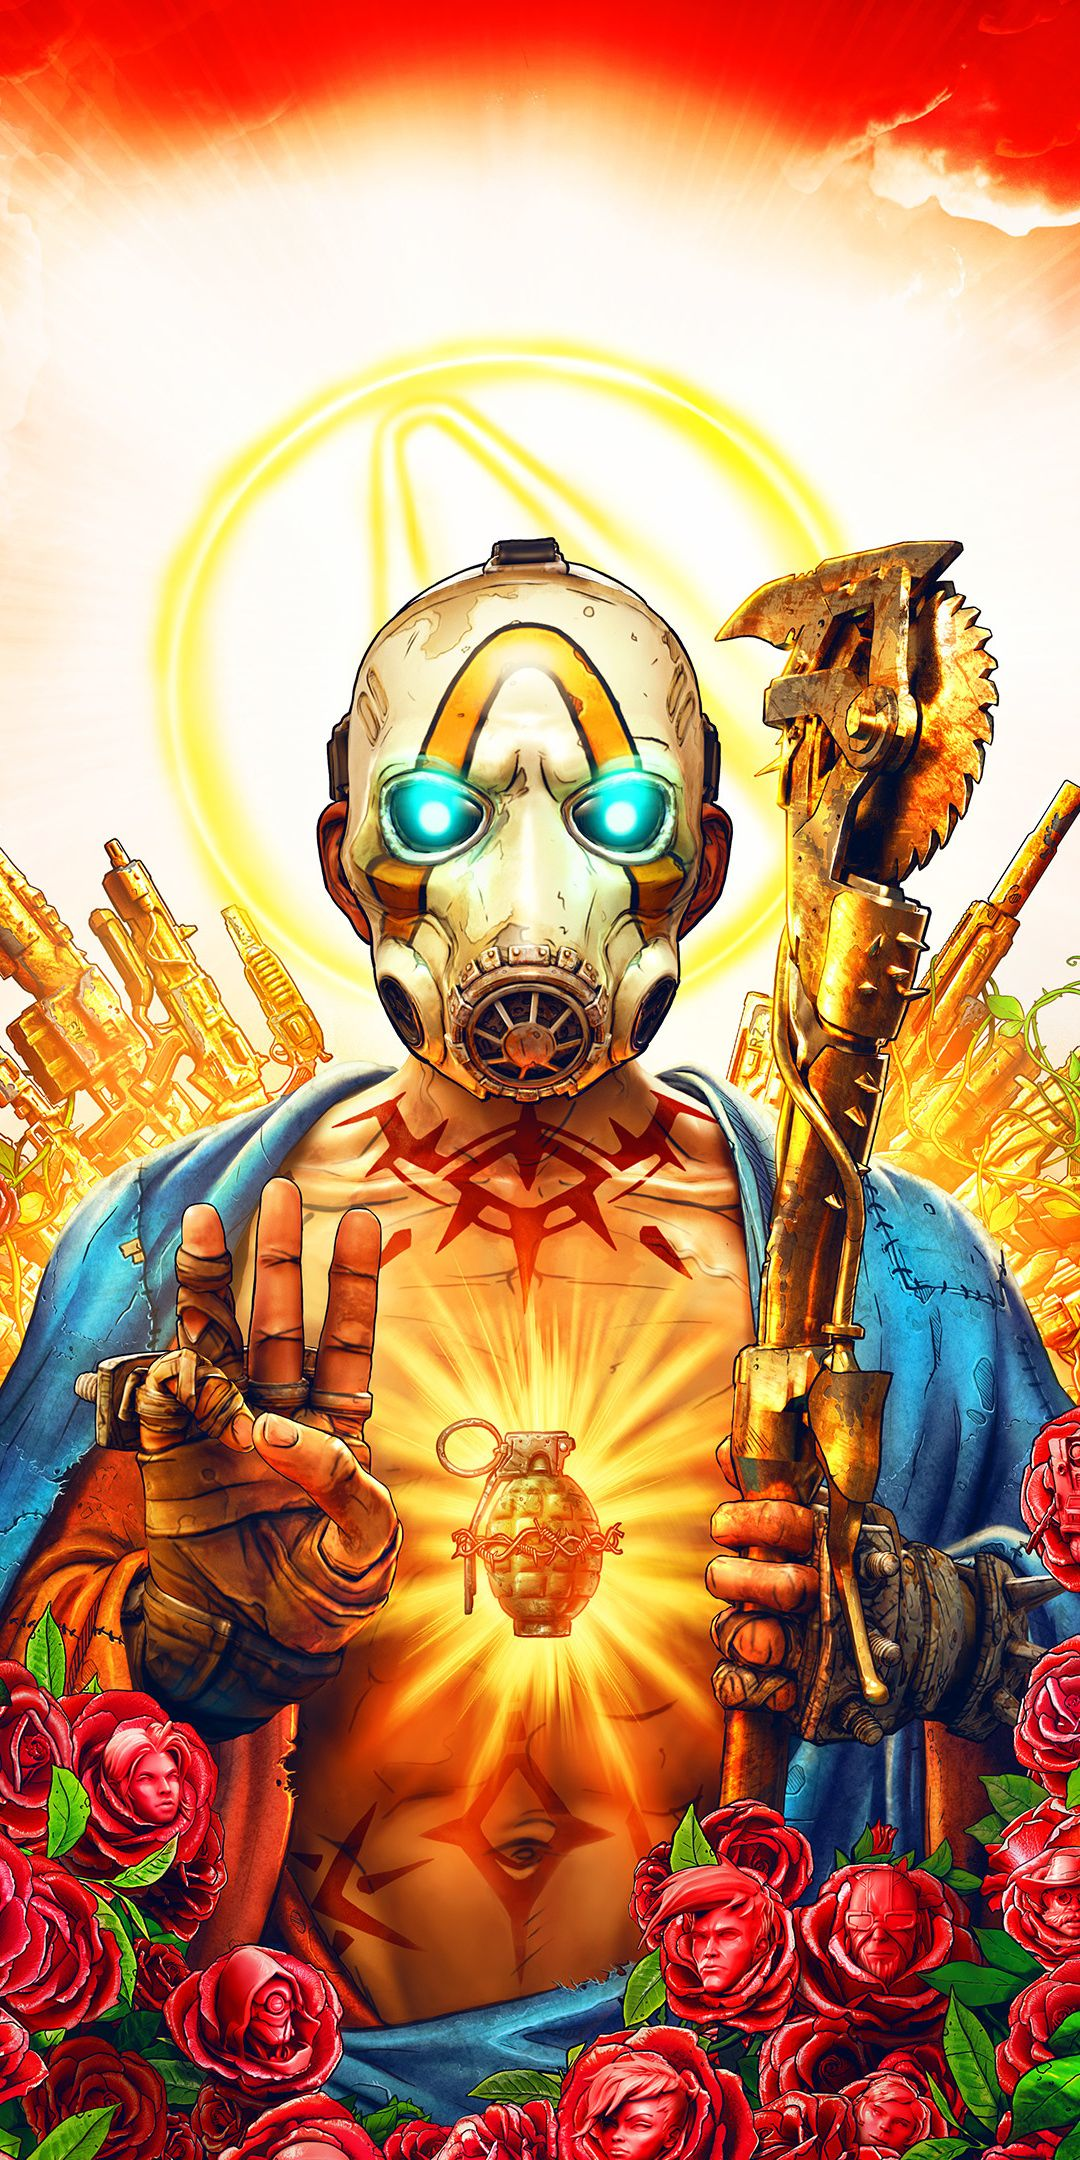 Video Game Poster Borderlands 3 Wallpaper Borderlands Art